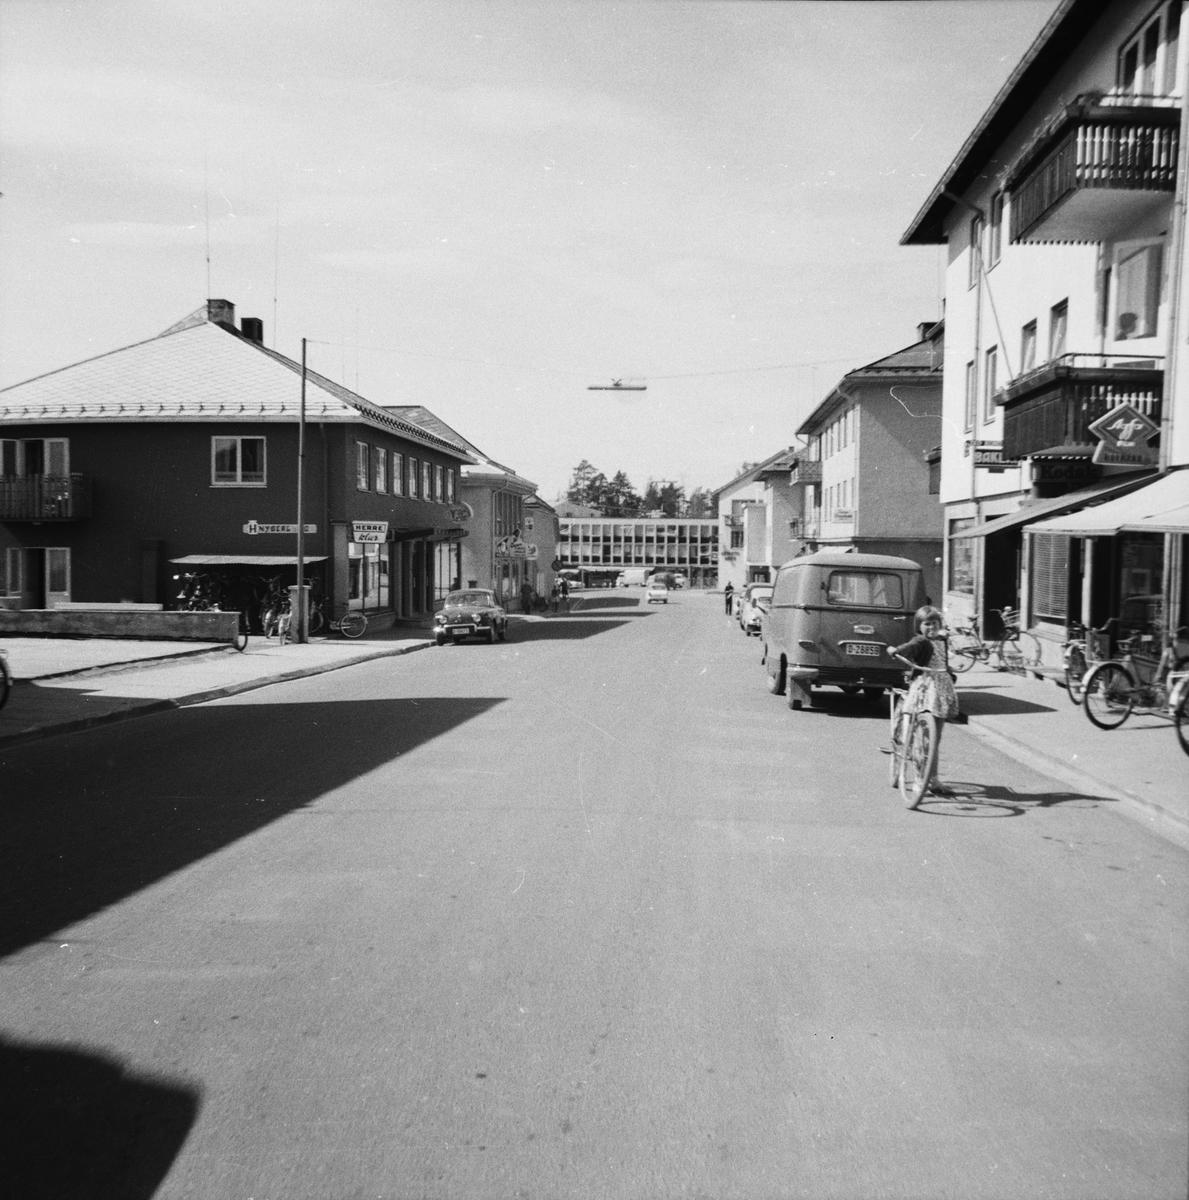 St. Olavs gate, Leiret. Elverum.